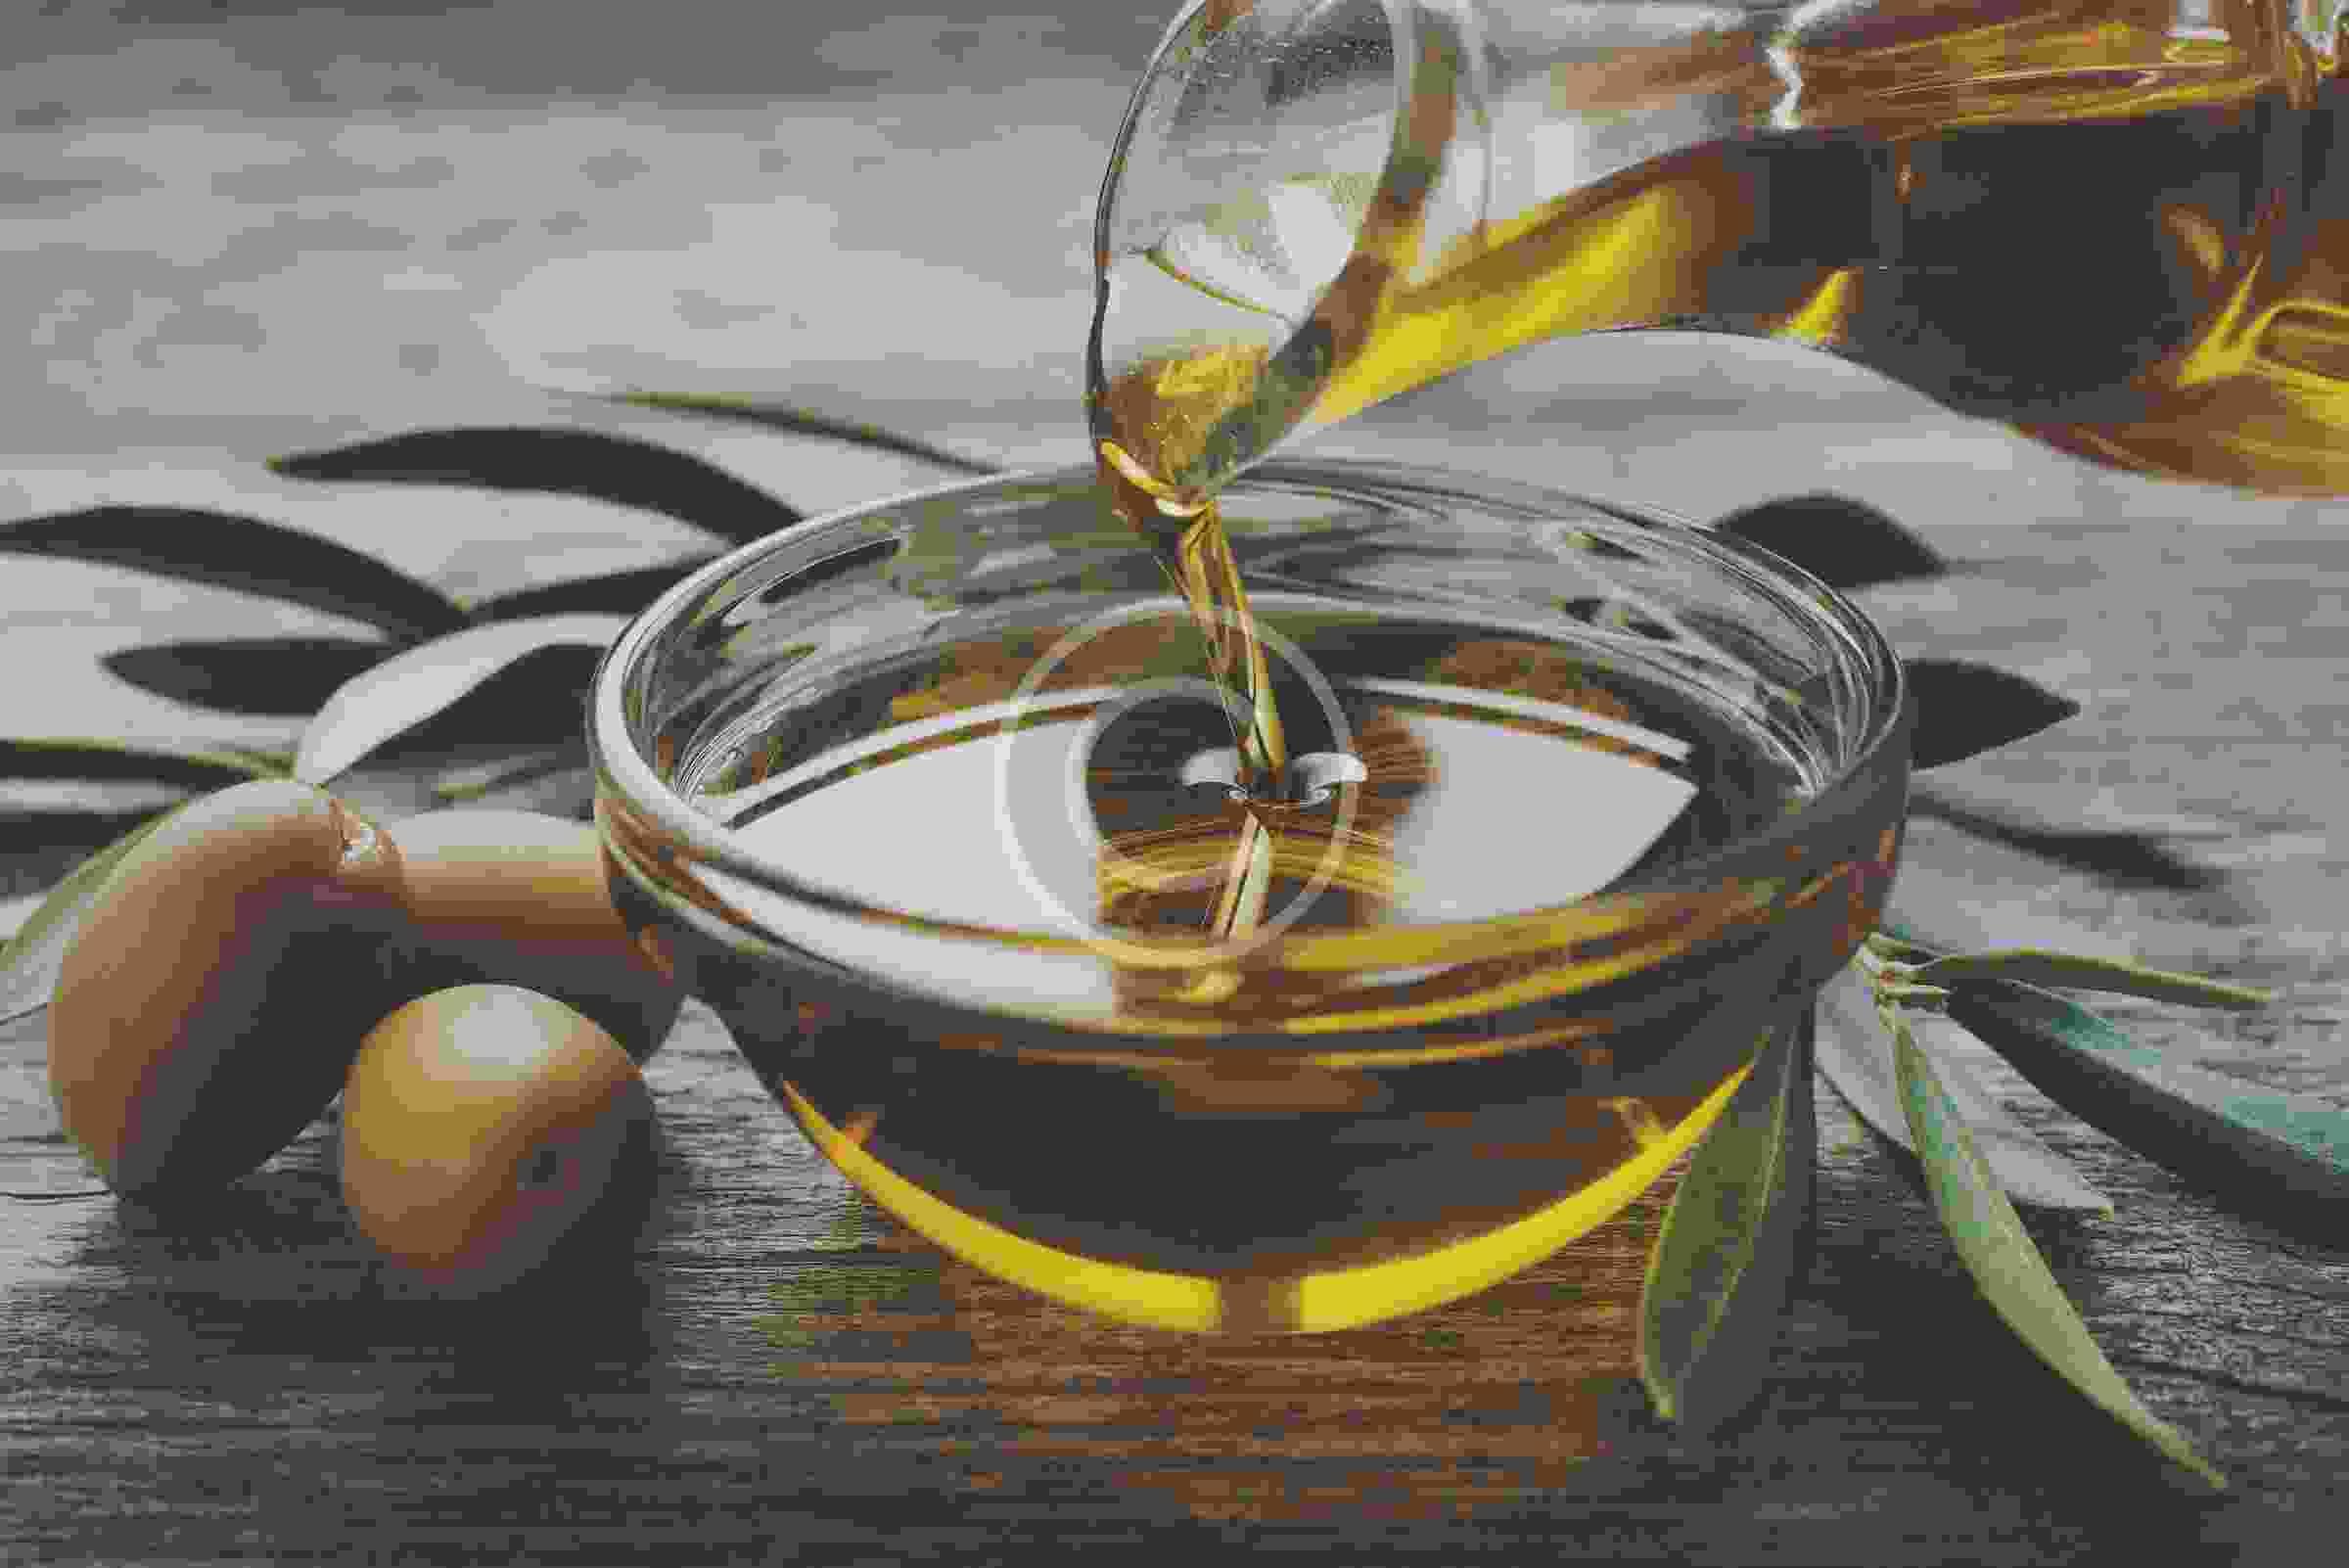 Olives sélectionnées